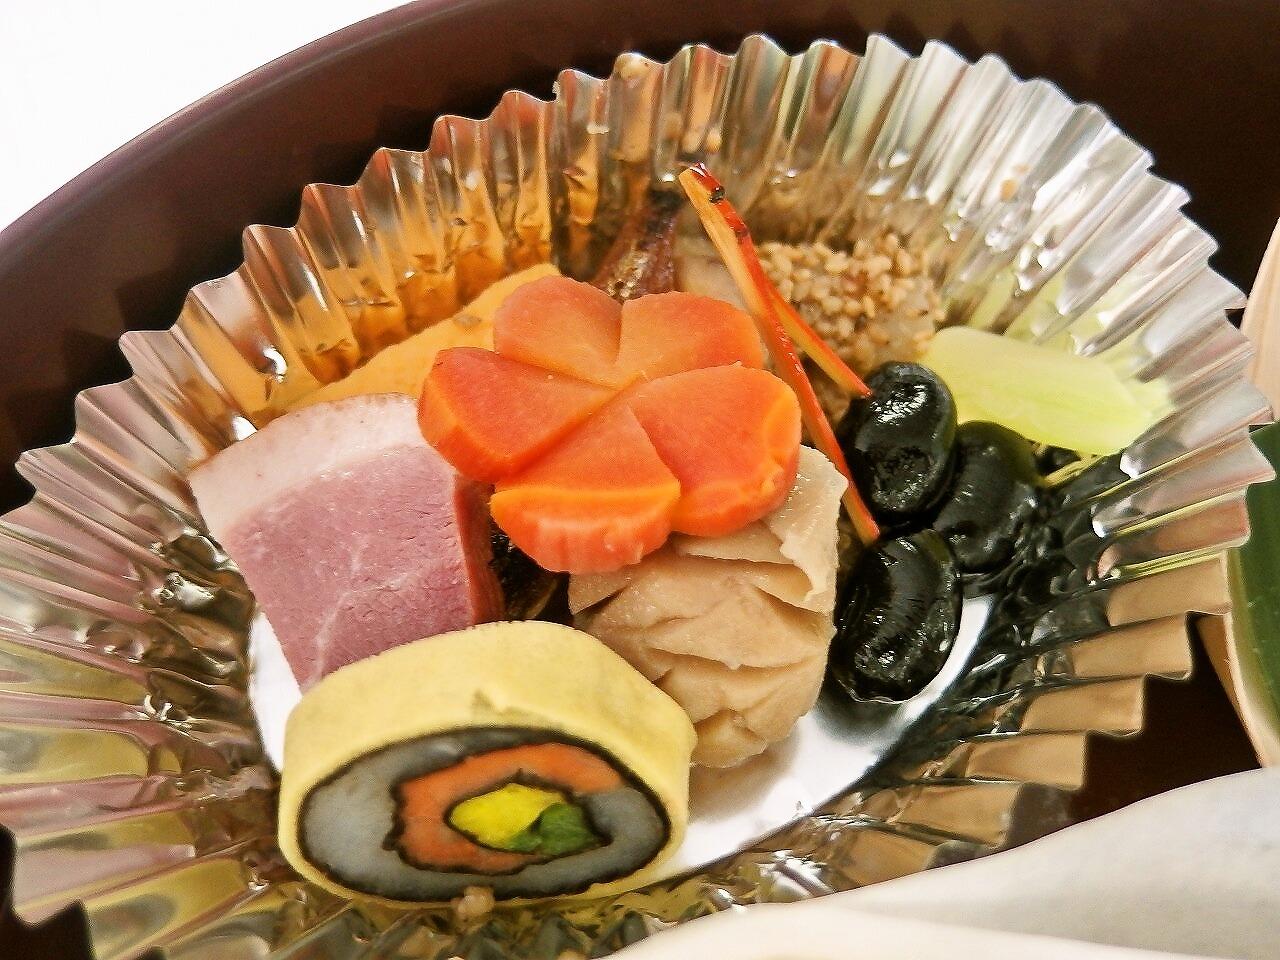 s-foodpic7439502.jpg